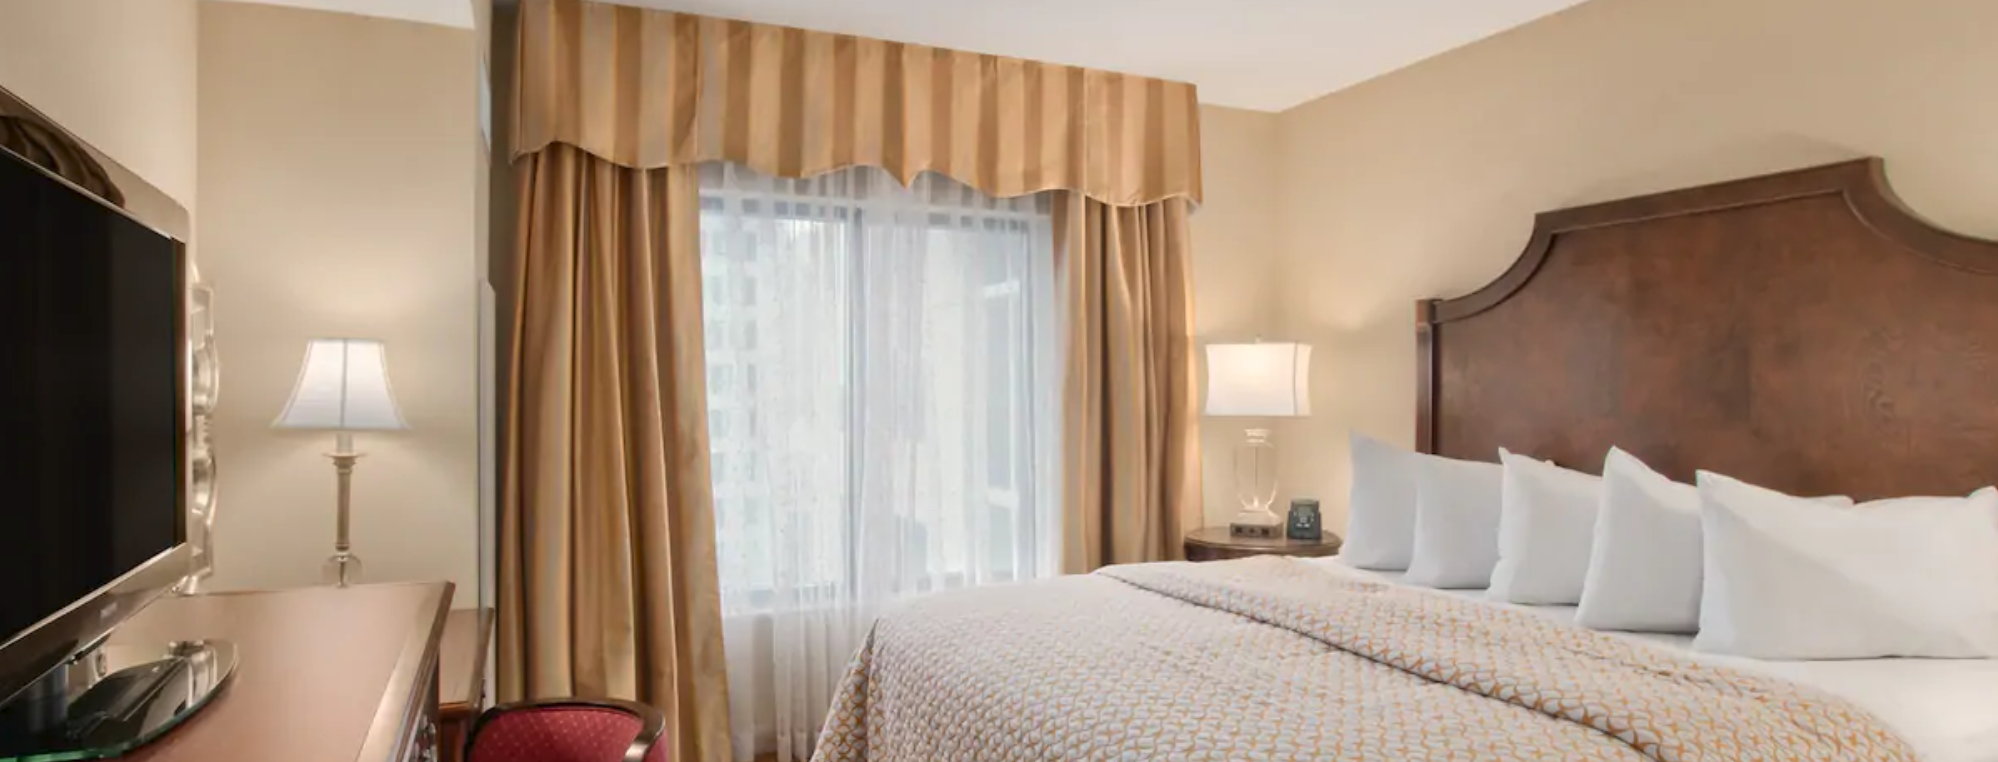 https://www.hotelsbyday.com/_data/default-hotel_image/4/20553/screenshot-2020-08-14-at-12-37-39-pm.png